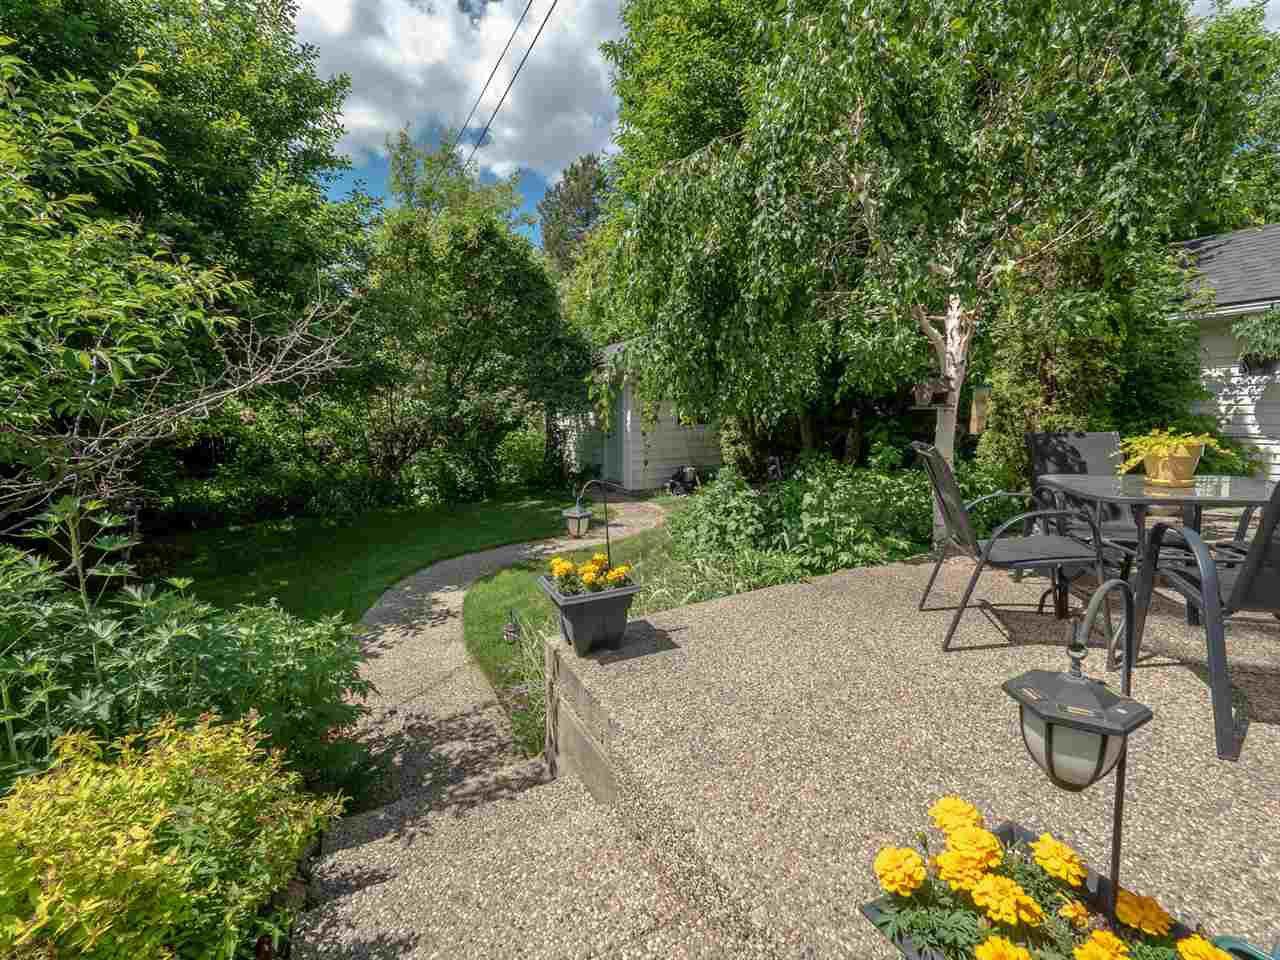 Main Photo: 11234 61 Street in Edmonton: Zone 09 House for sale : MLS®# E4164052